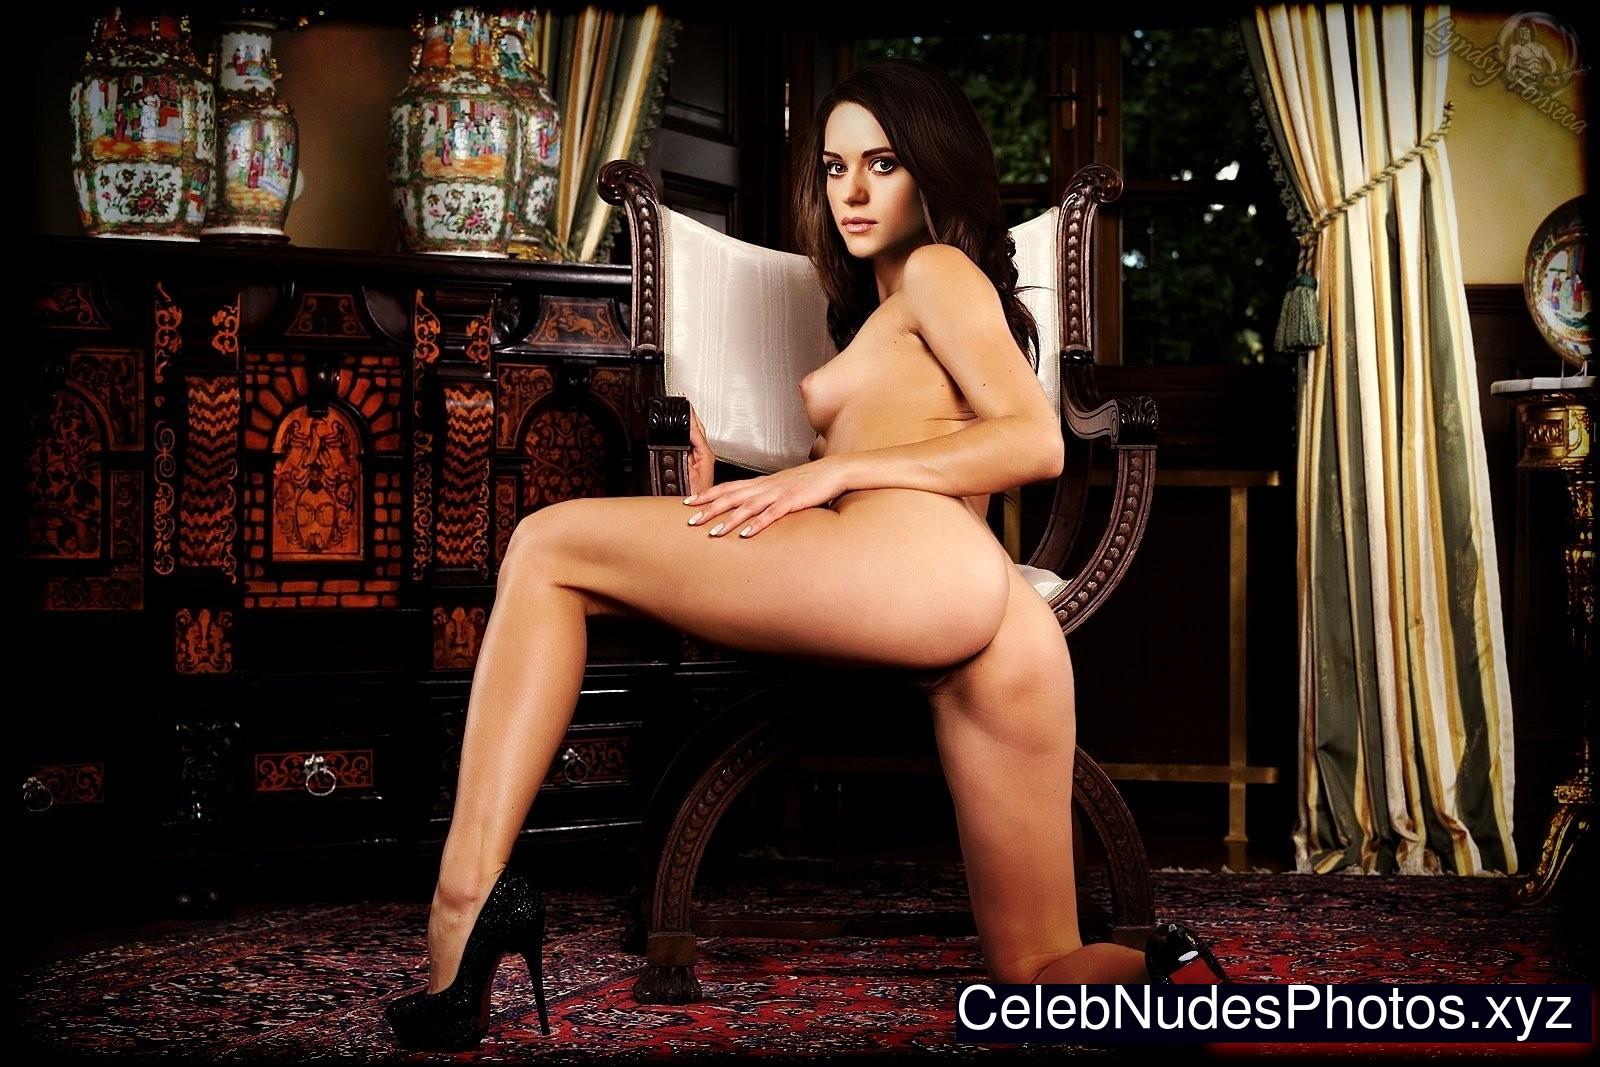 lyndsy fonseca nude